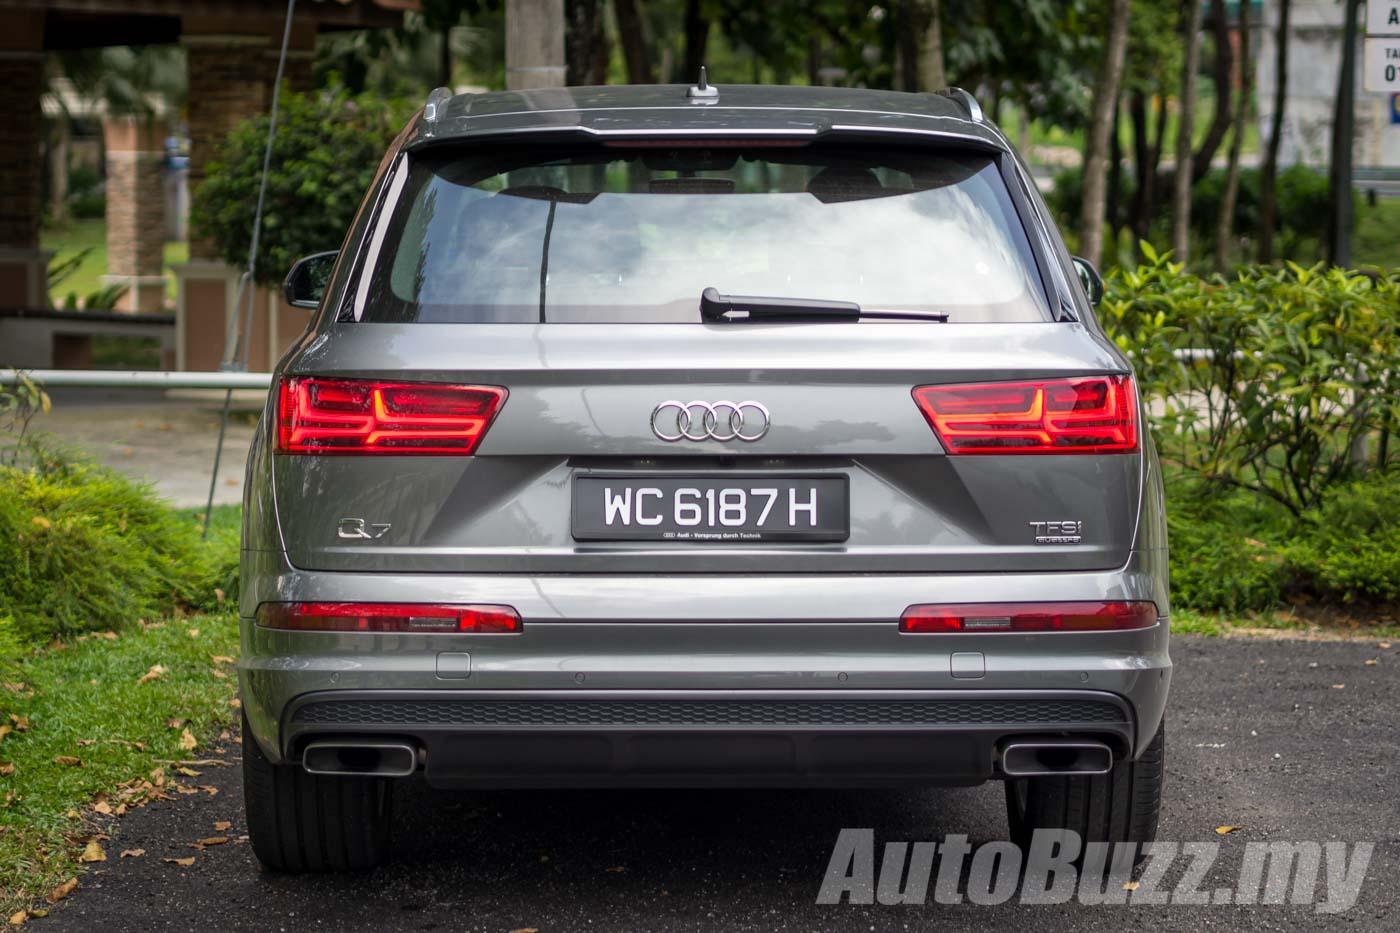 Audi Q7 2.0 TFSI Quattro launched in Malaysia, now RM65k cheaper at Audi Graphite Grey on audi moss green, audi bronze, audi chrome, audi cobalt blue, audi maroon, audi yellow, audi black, audi midnight blue, audi white, audi gold, audi purple,